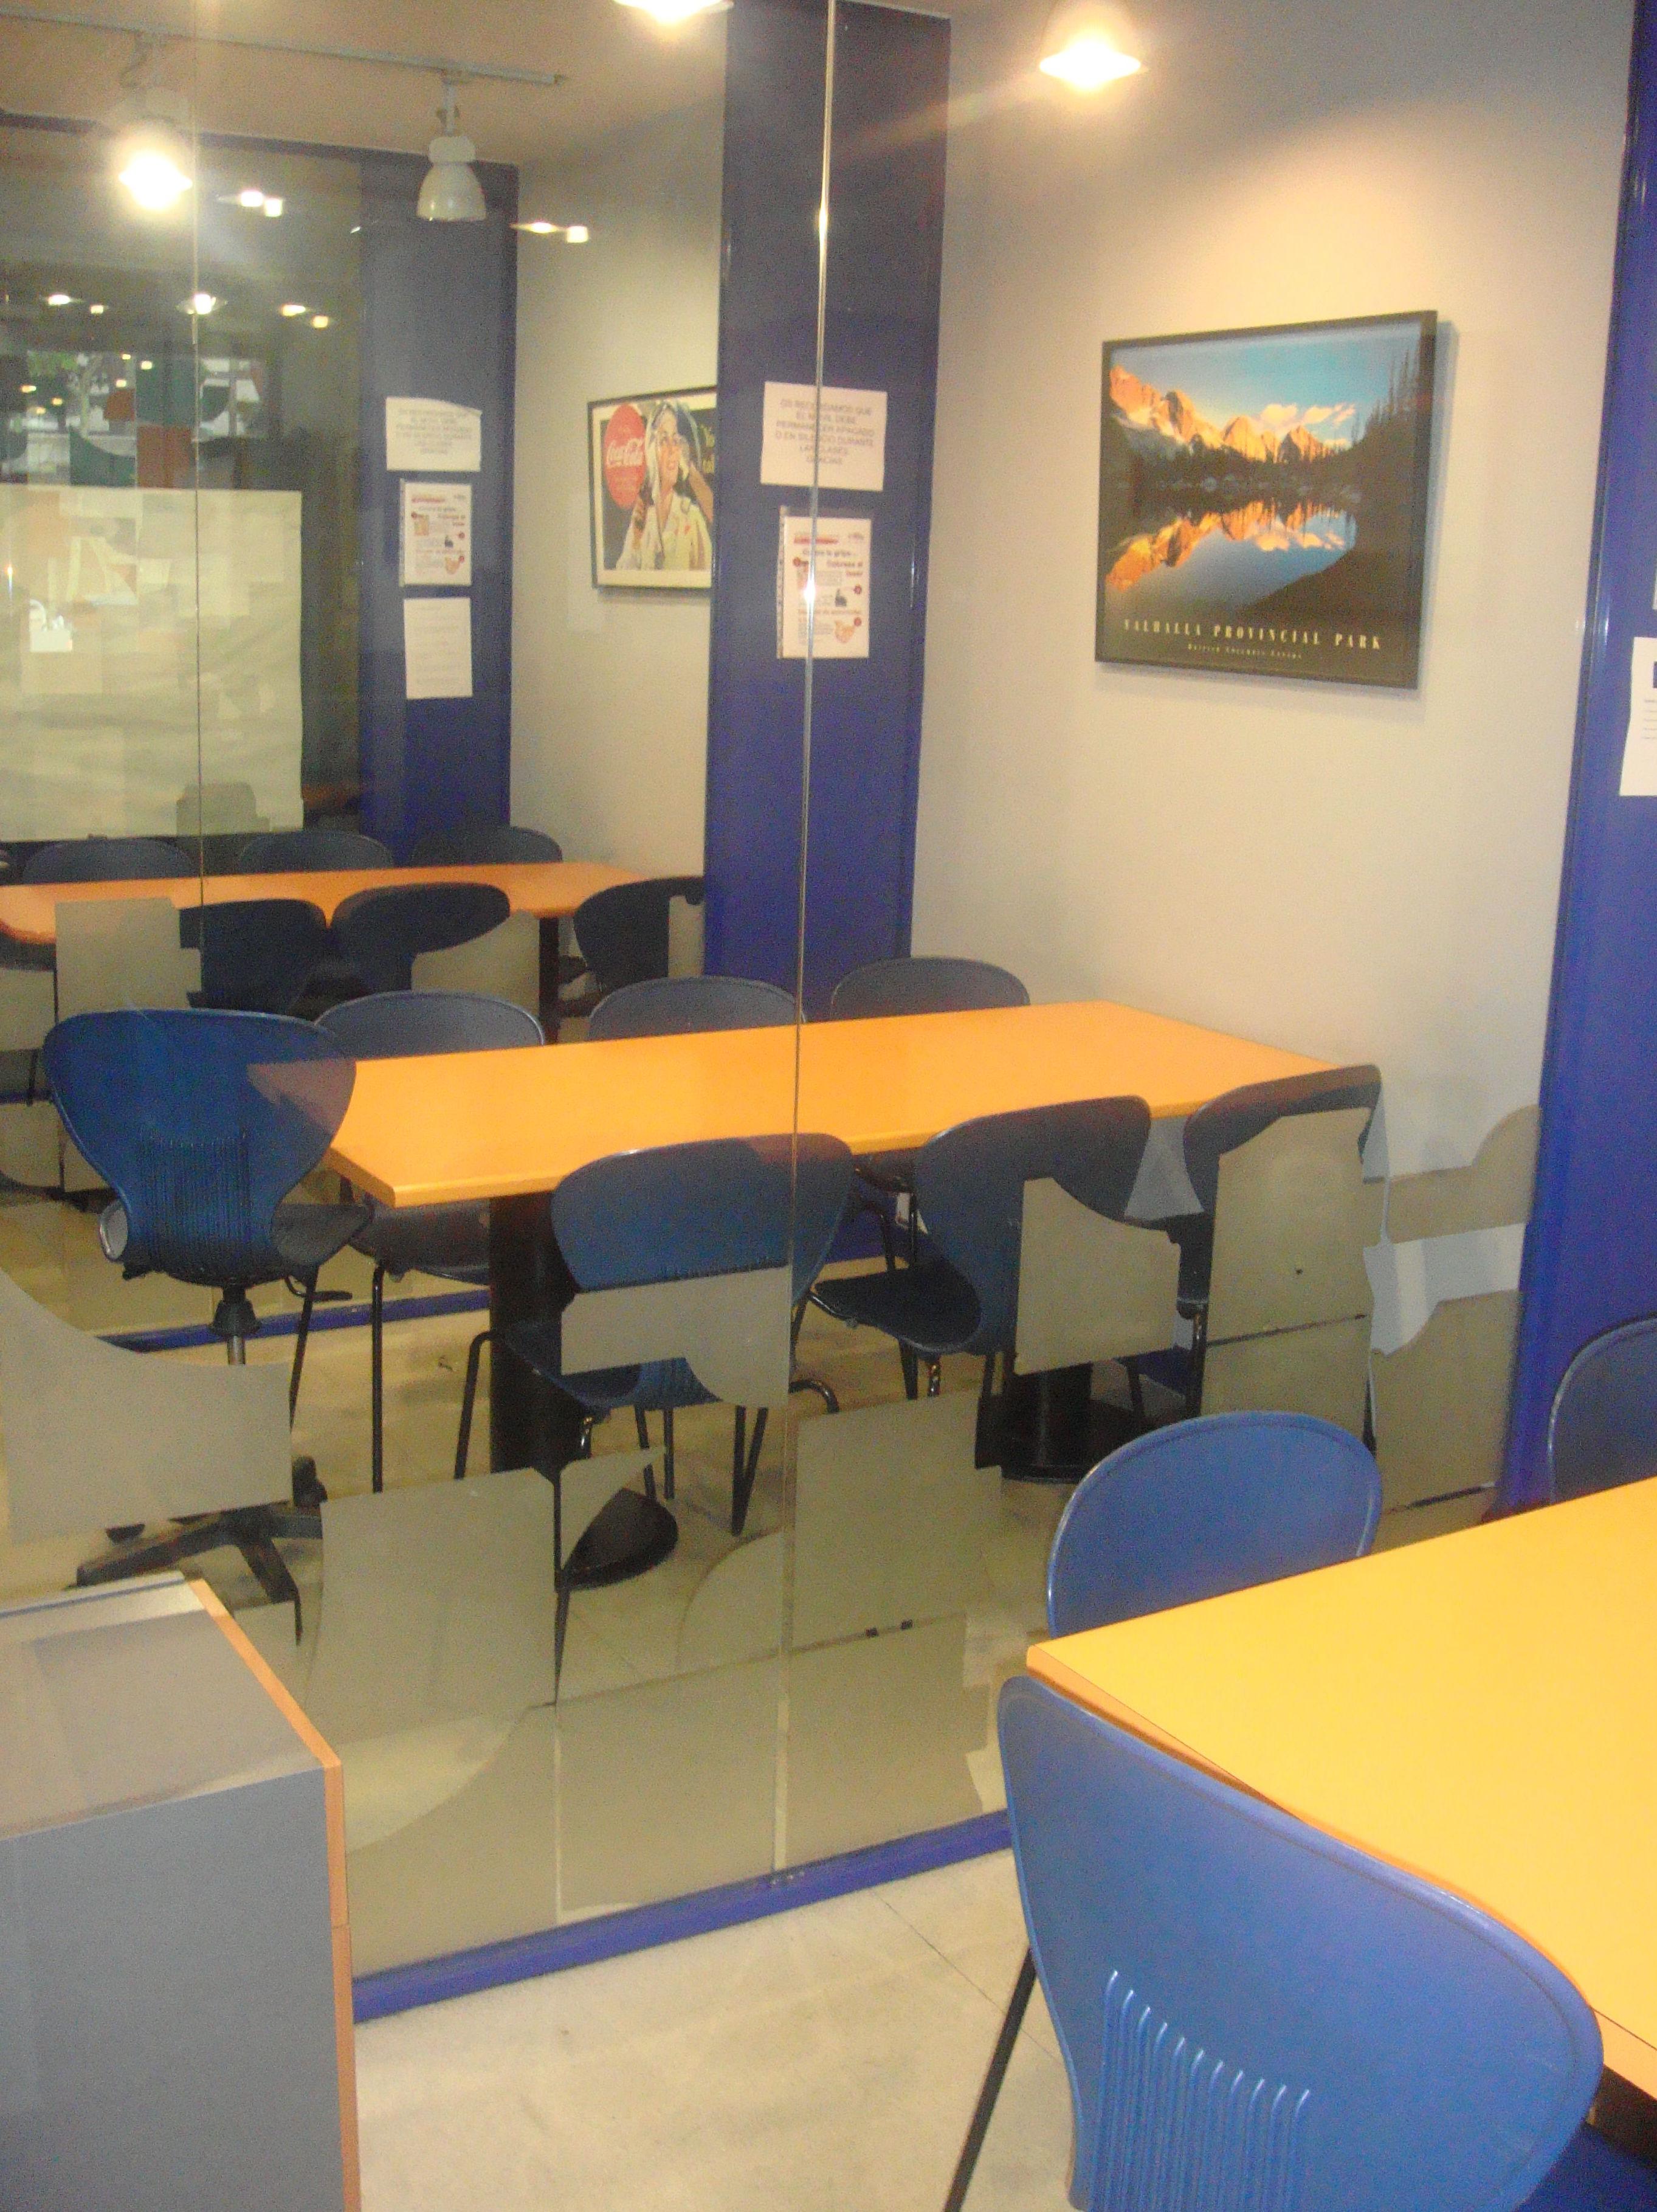 Exámenes A1, A2, B1, B2, C1 de inglés en Madrid